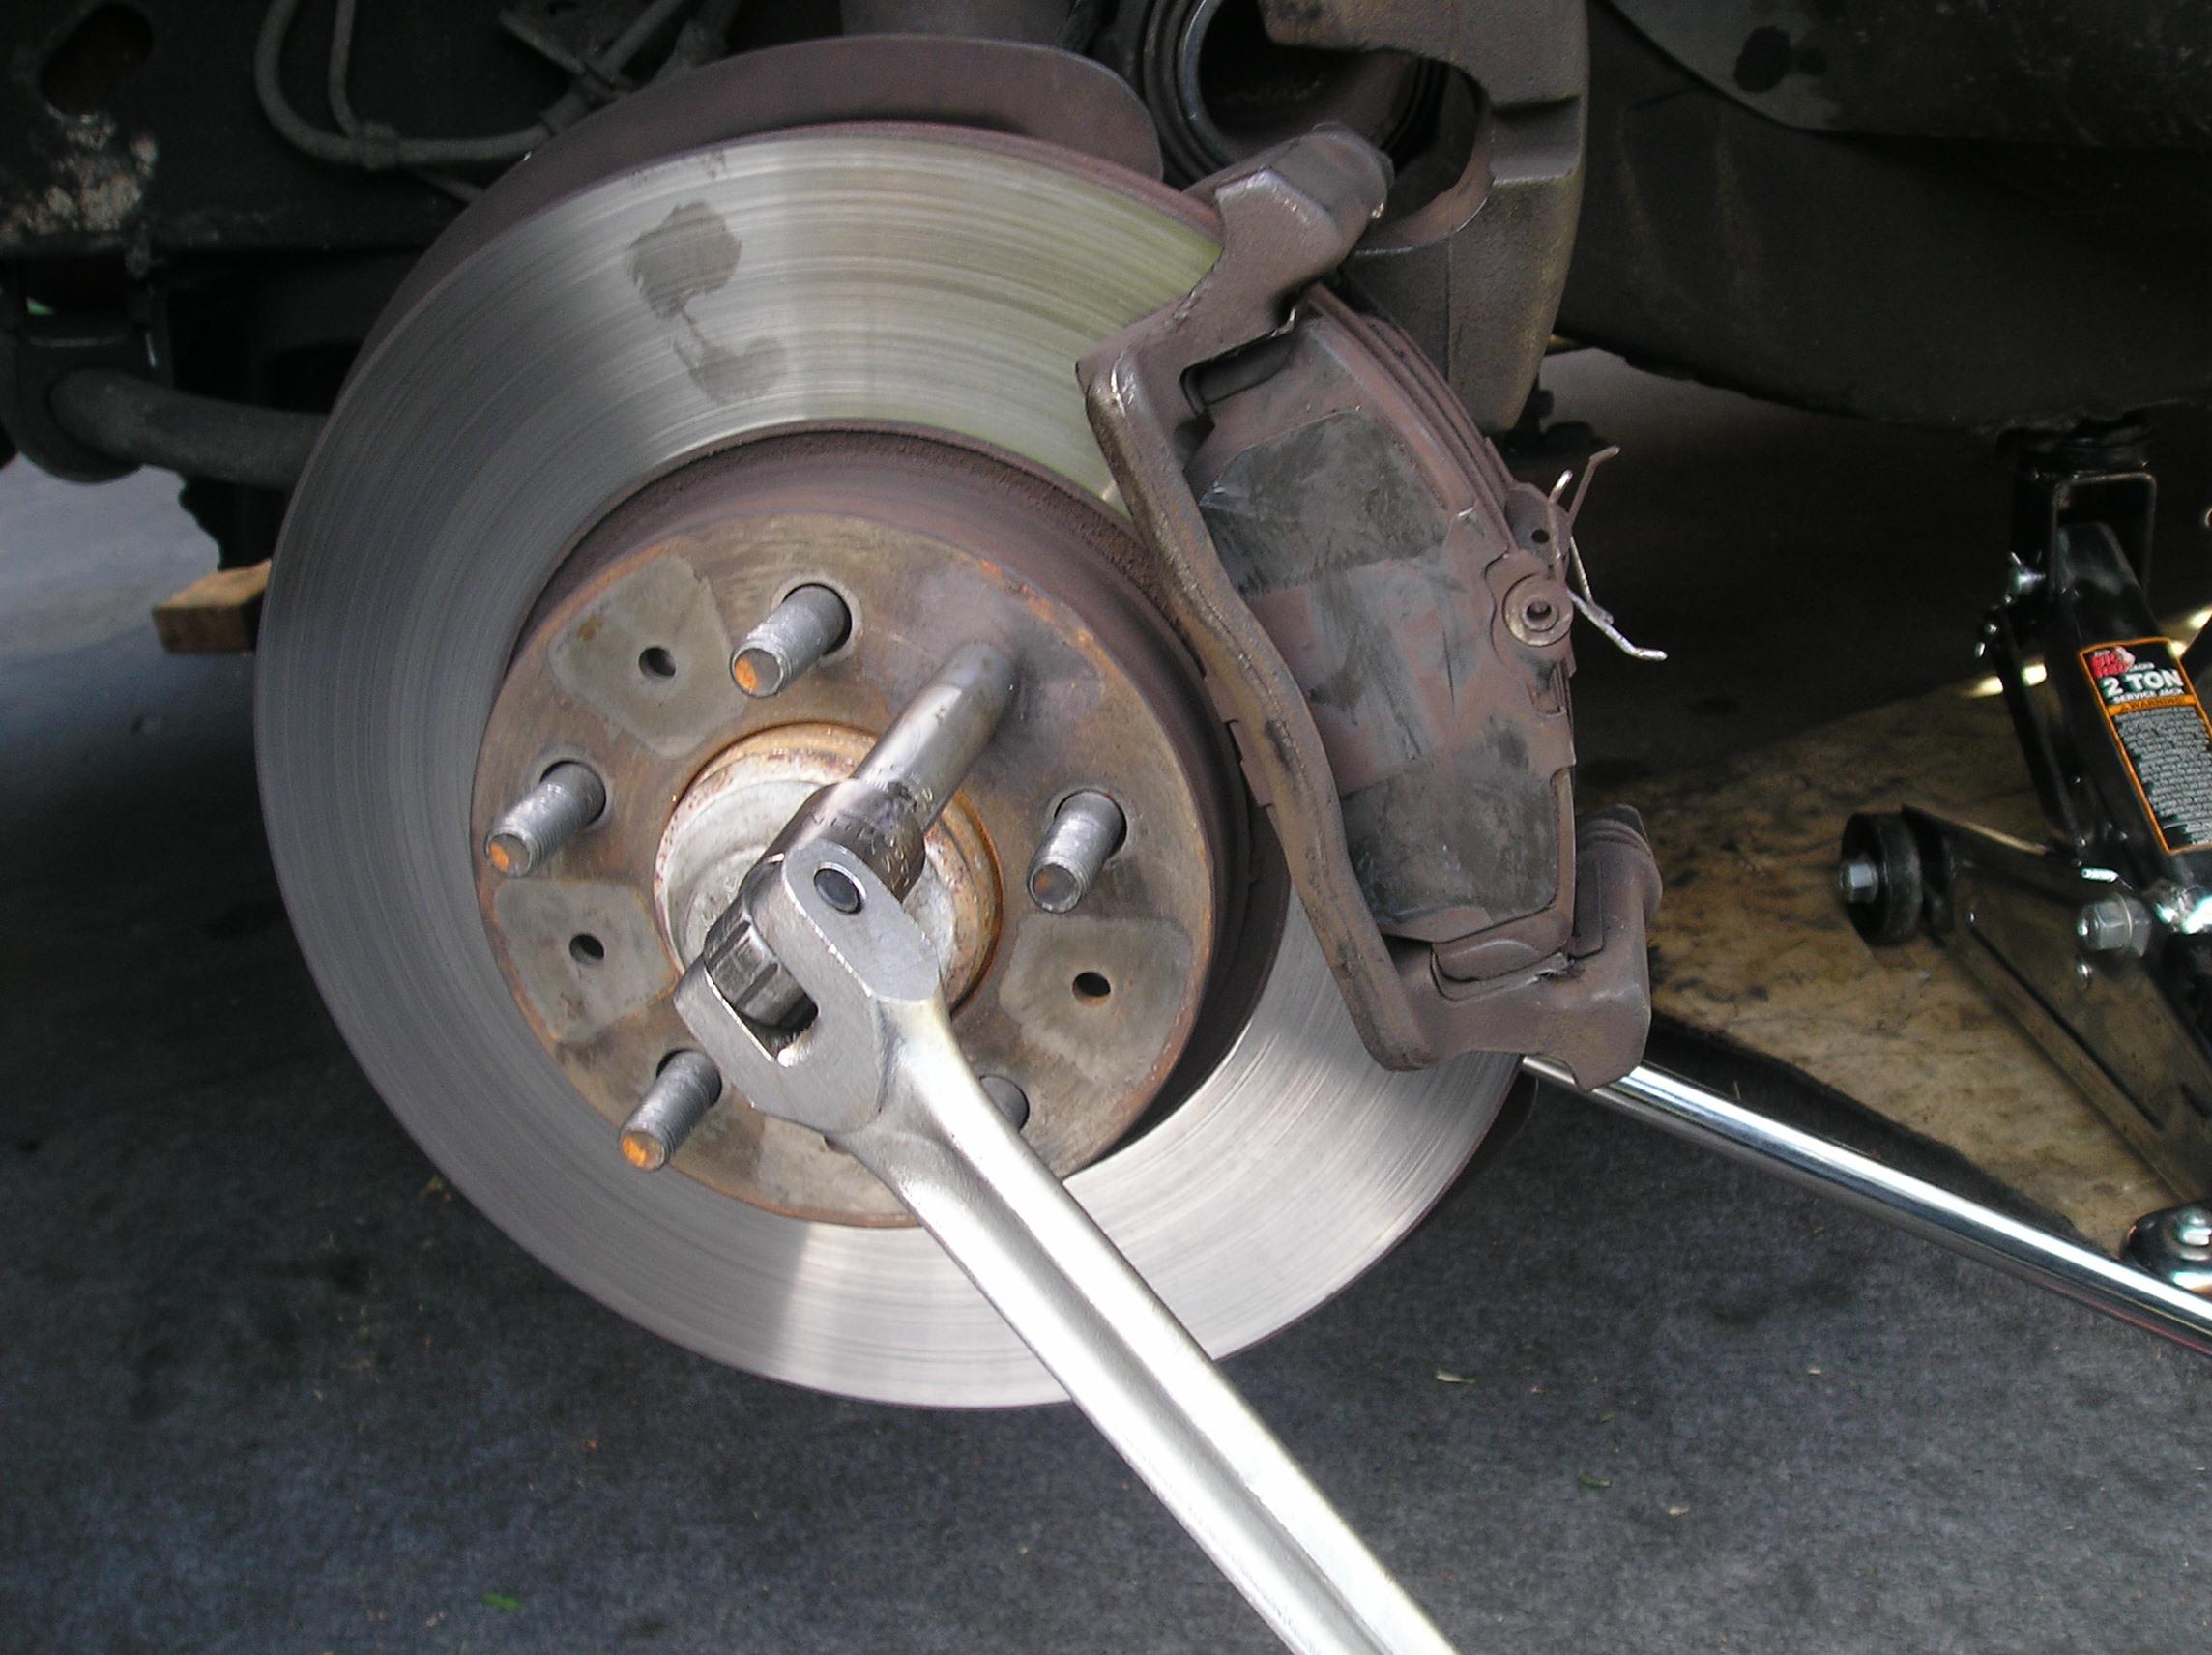 Volvo 940 Front brake job DIY tutorial - removing lug nuts